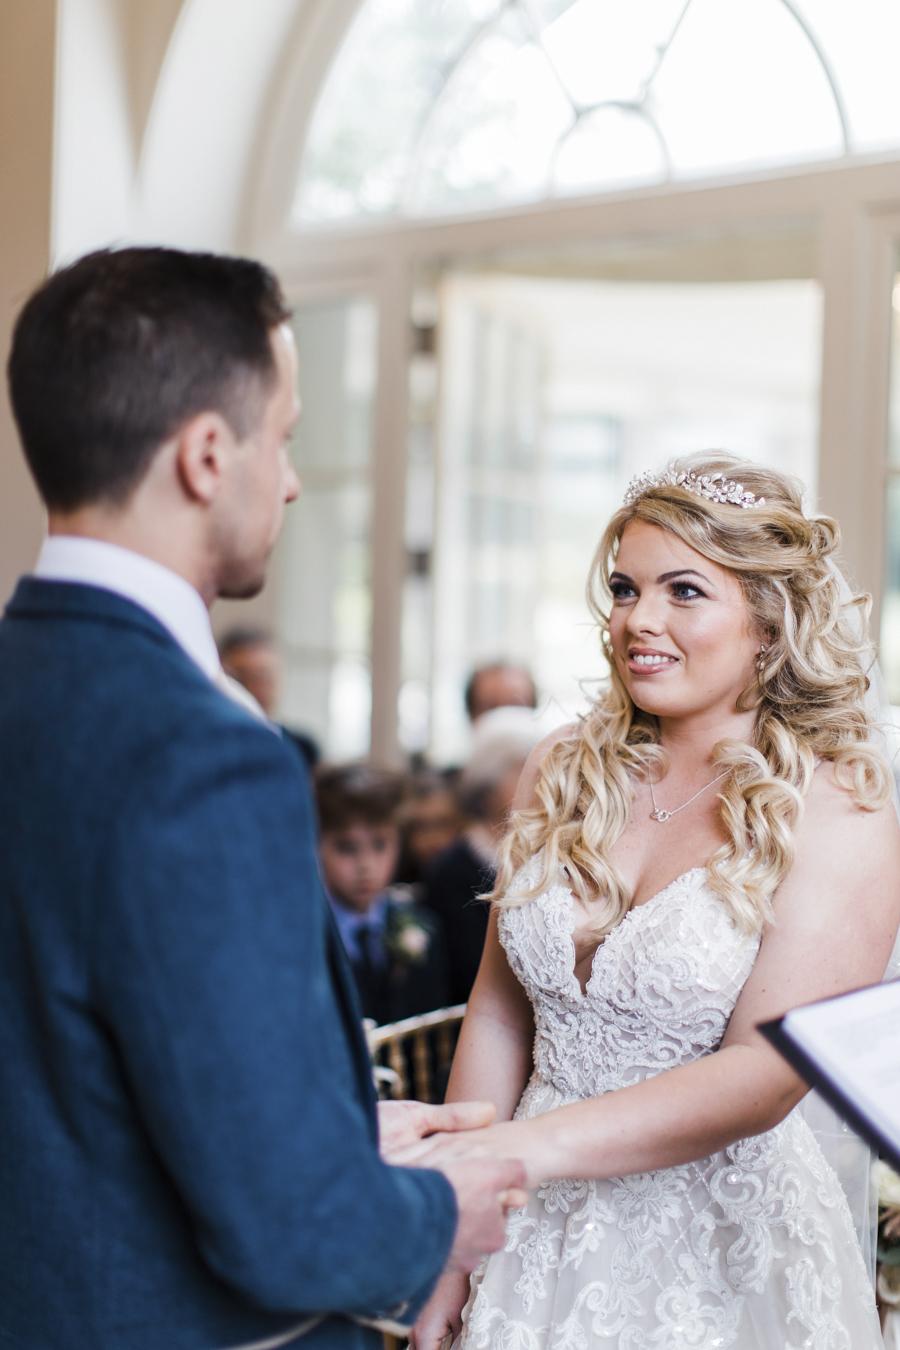 Rachel & Ben's beautiful Iscoyd Park wedding with Anna Beth Photography (18)